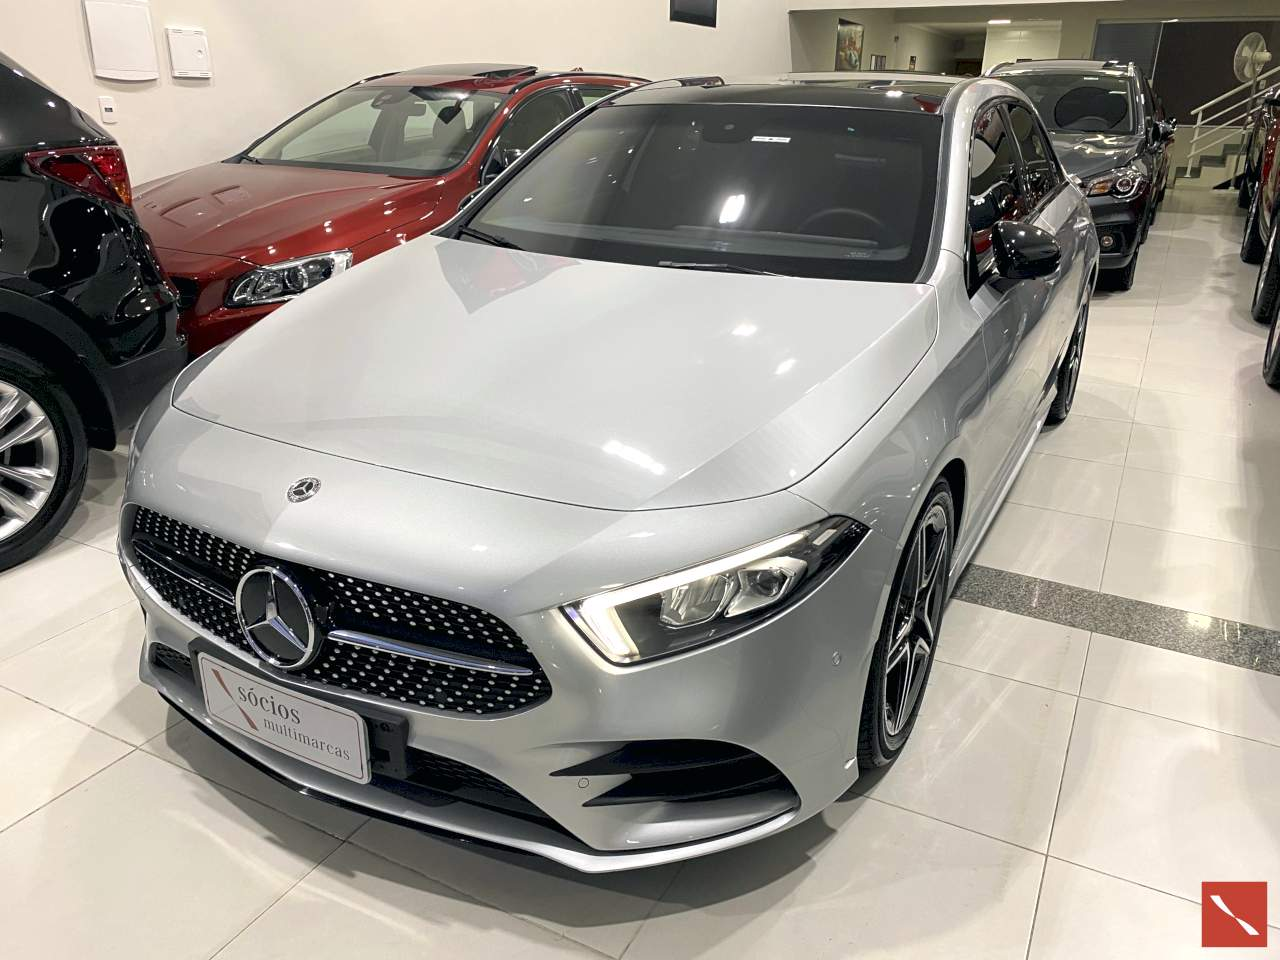 Mercedes A250 Launch Edition 2018/2019